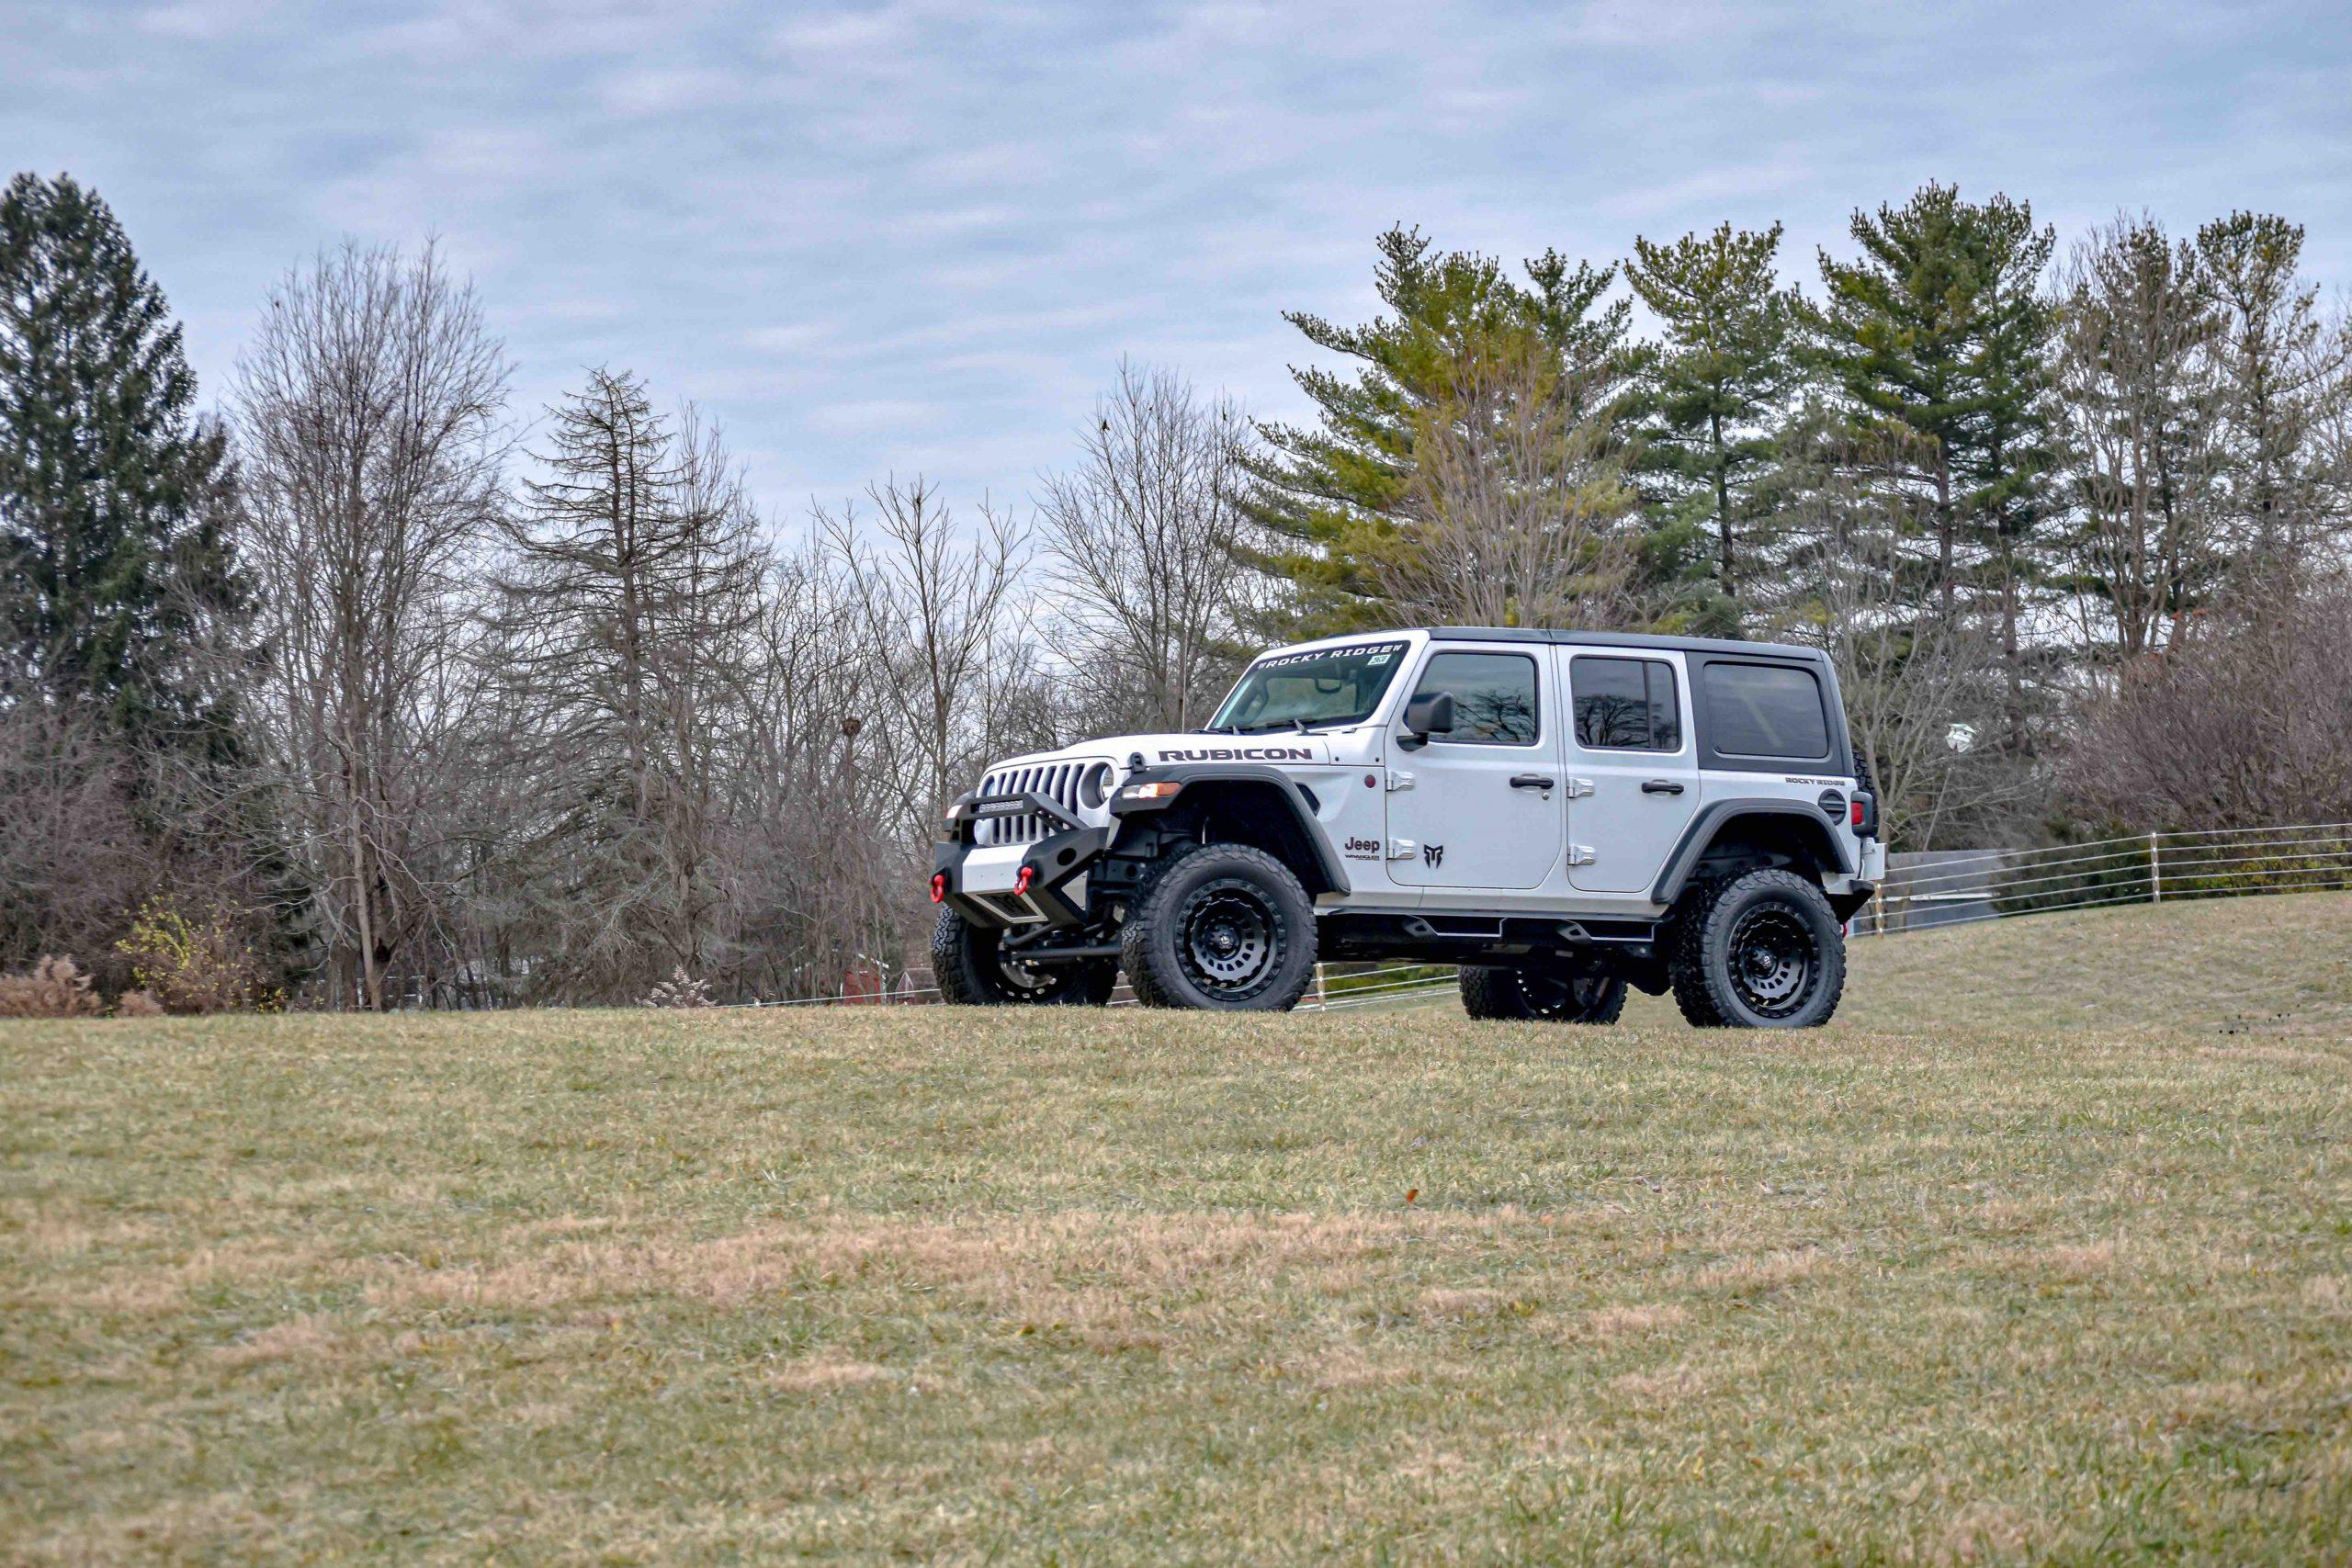 sherry-4x4-lifted-trucks-jeeps